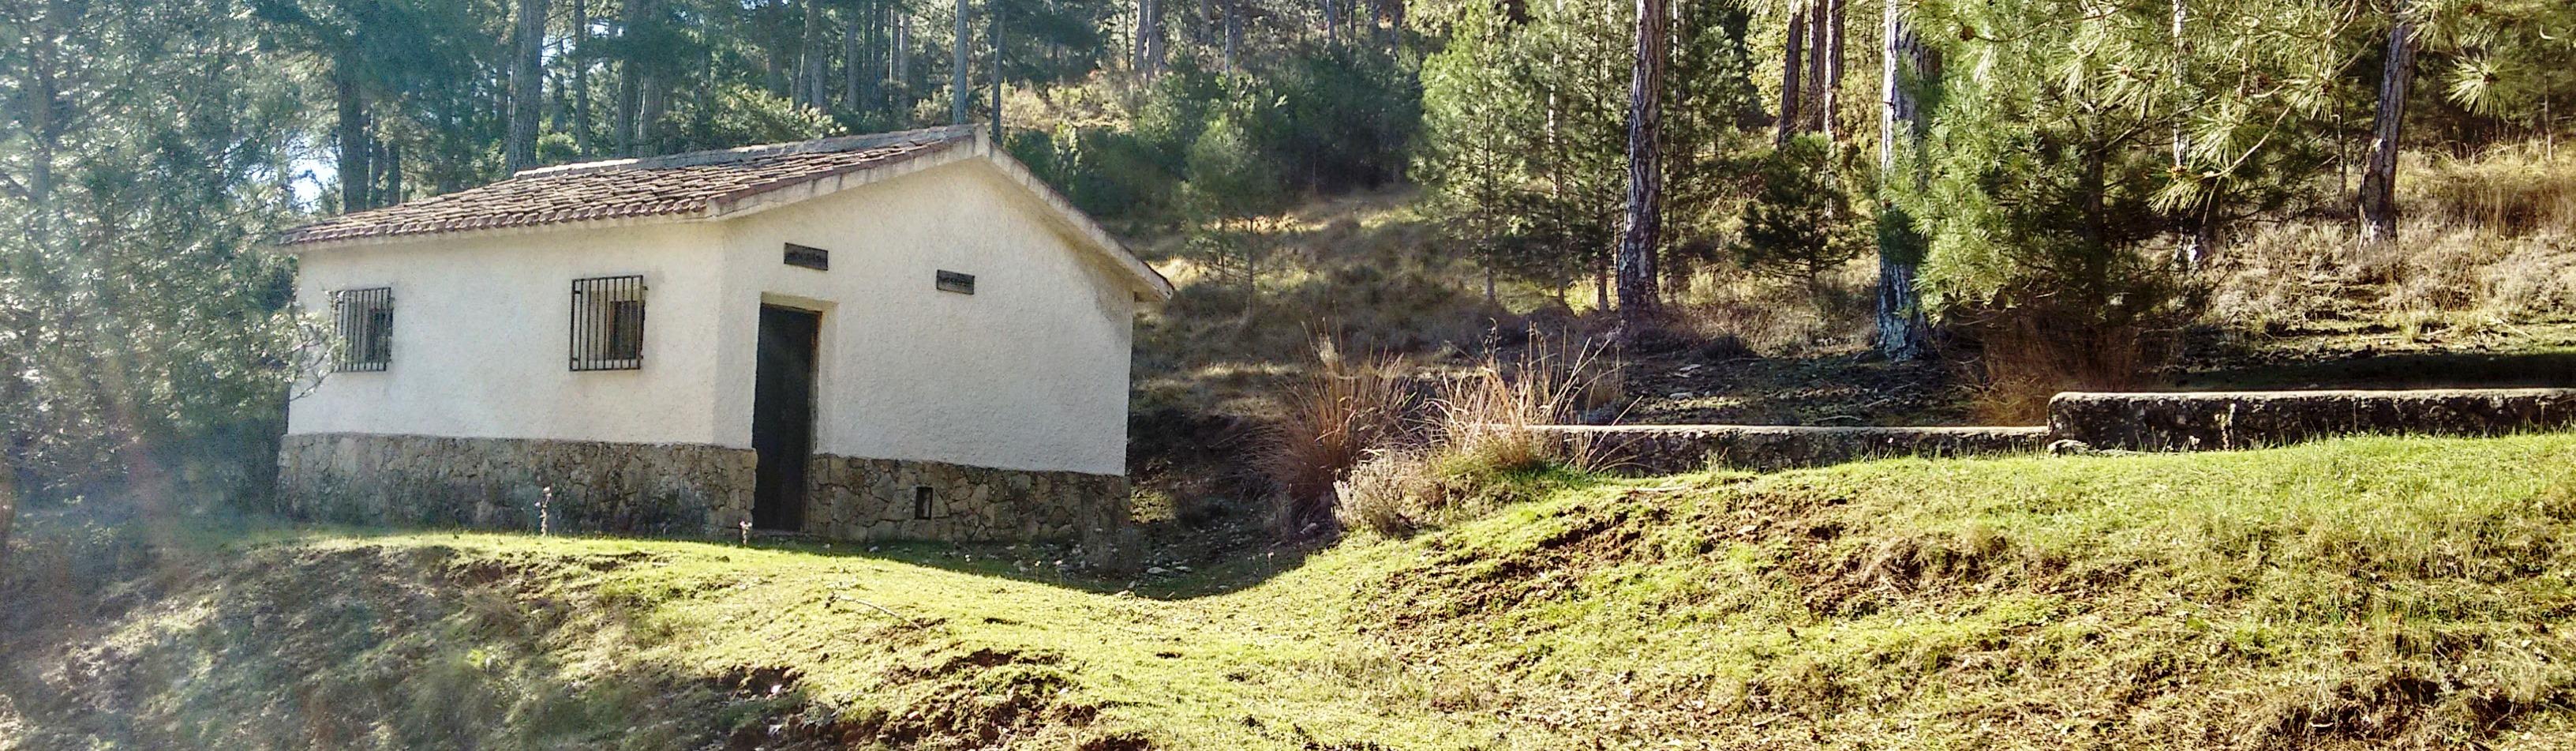 Refugio del prado